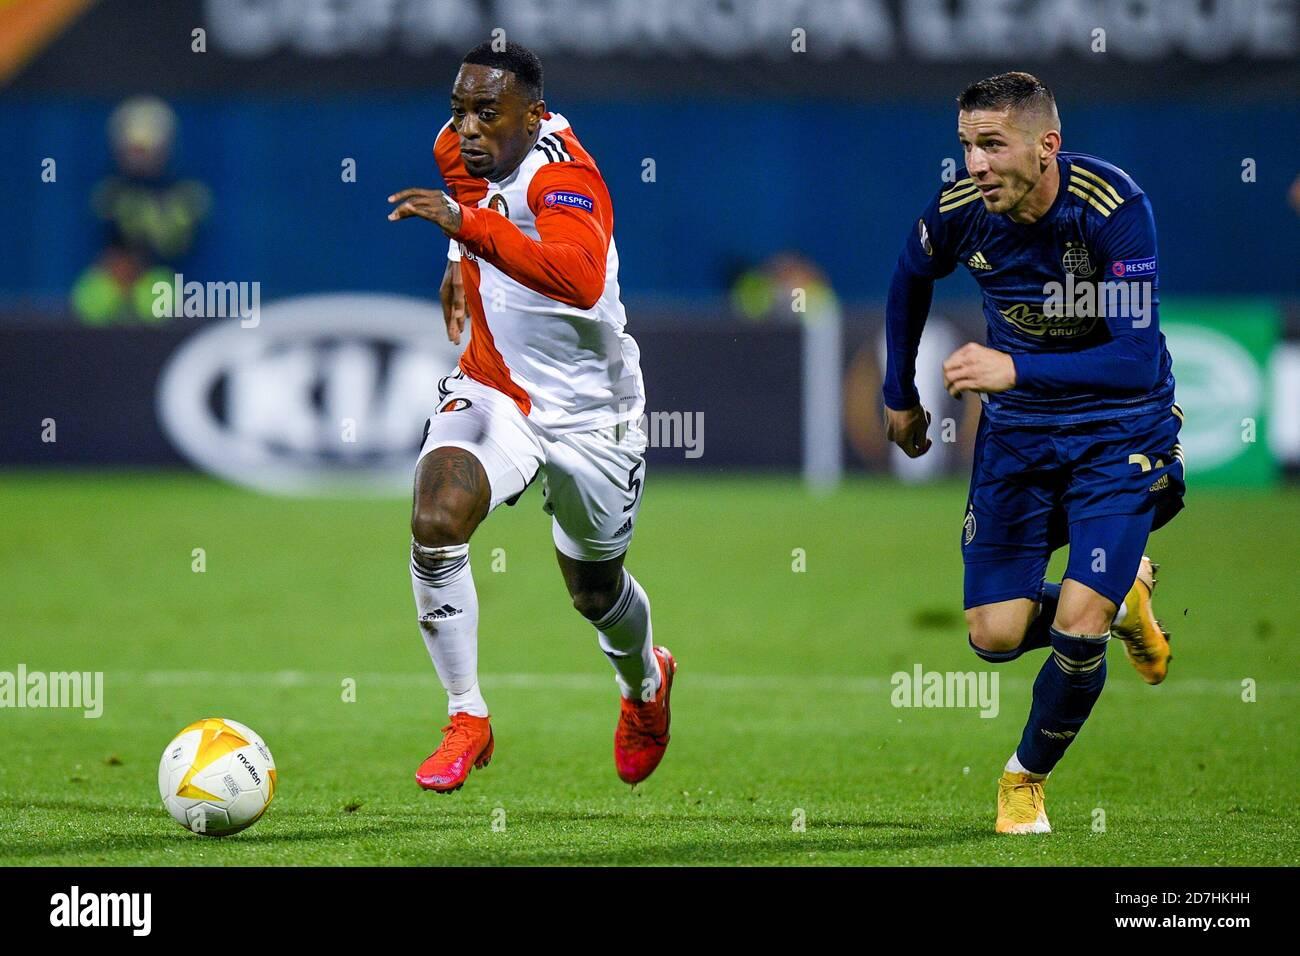 Zagreb Croatia October 22 Ridgeciano Haps Of Feyenoord Lirim Kastrati Of Dinamo Zagreb During The Uefa